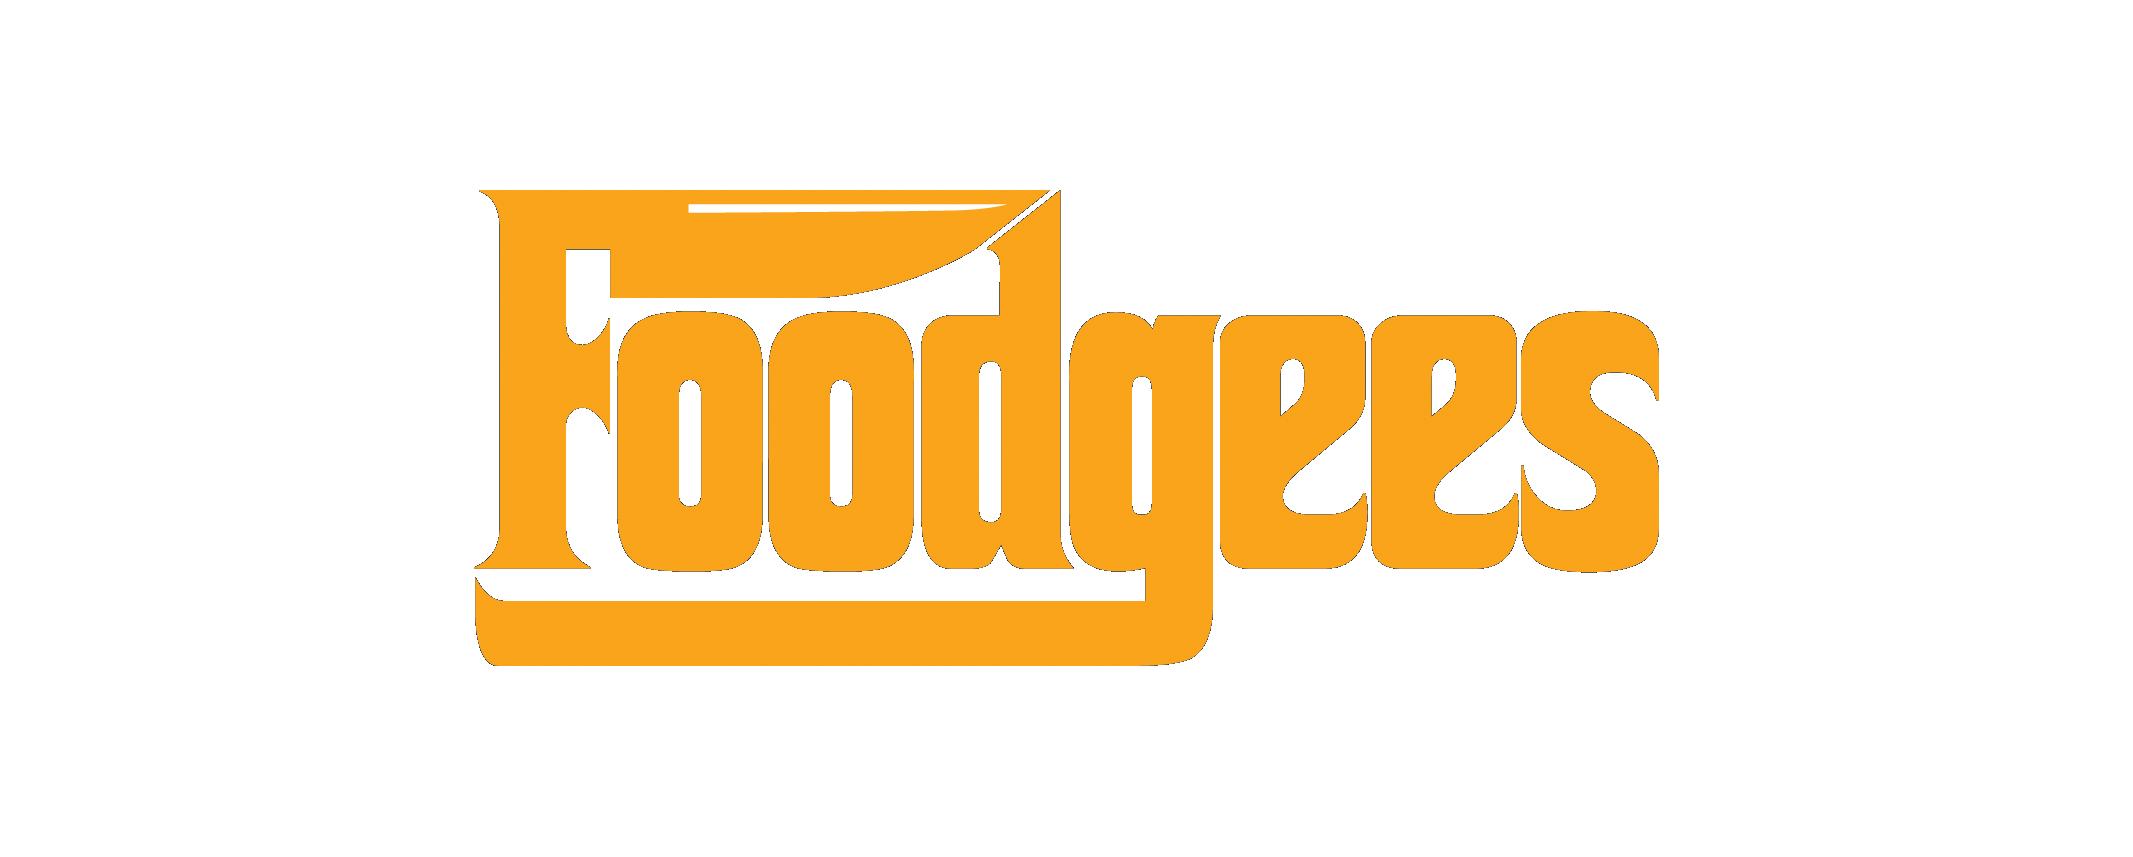 FOODGEES_LOGO_4Colour_MAIN-no-background_COPY.png